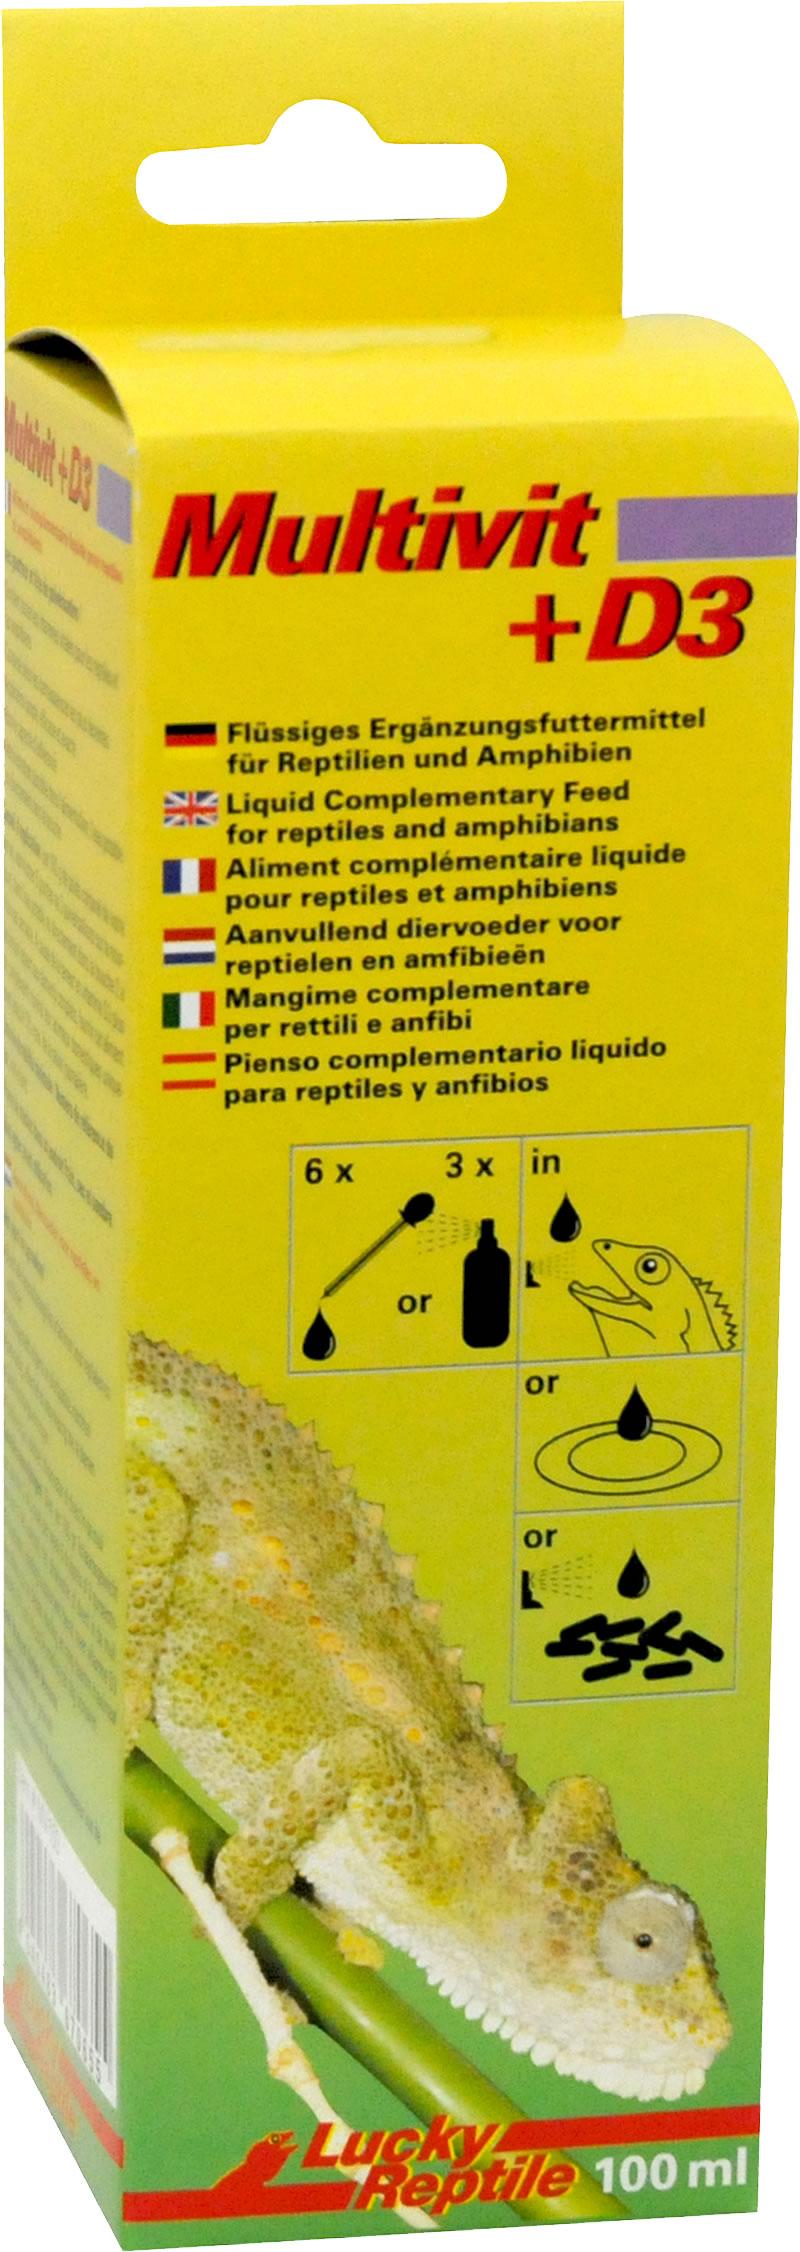 Lucky Reptile Multivit + D3 - 100 ml